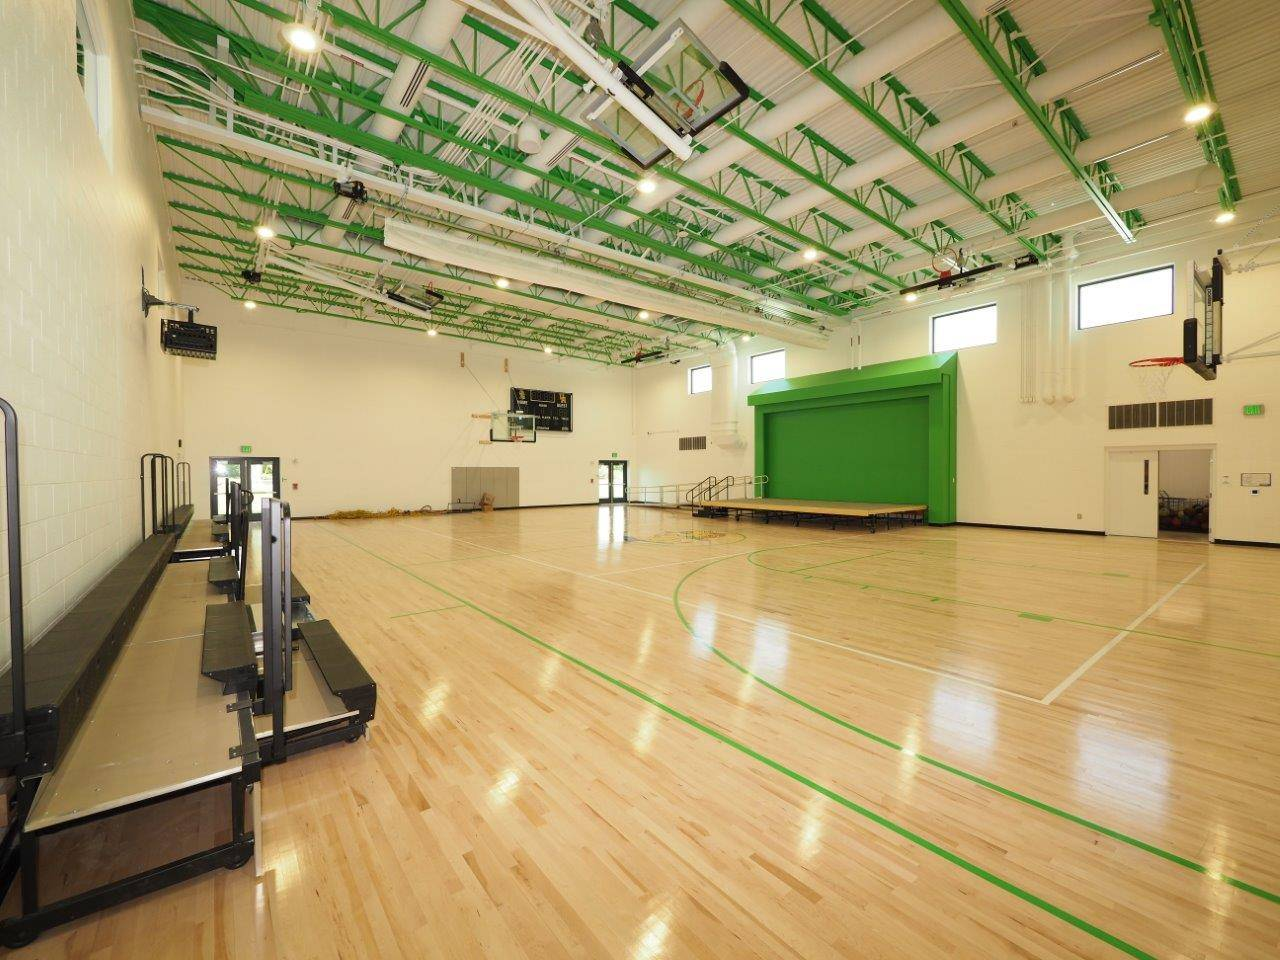 The new gymnasium